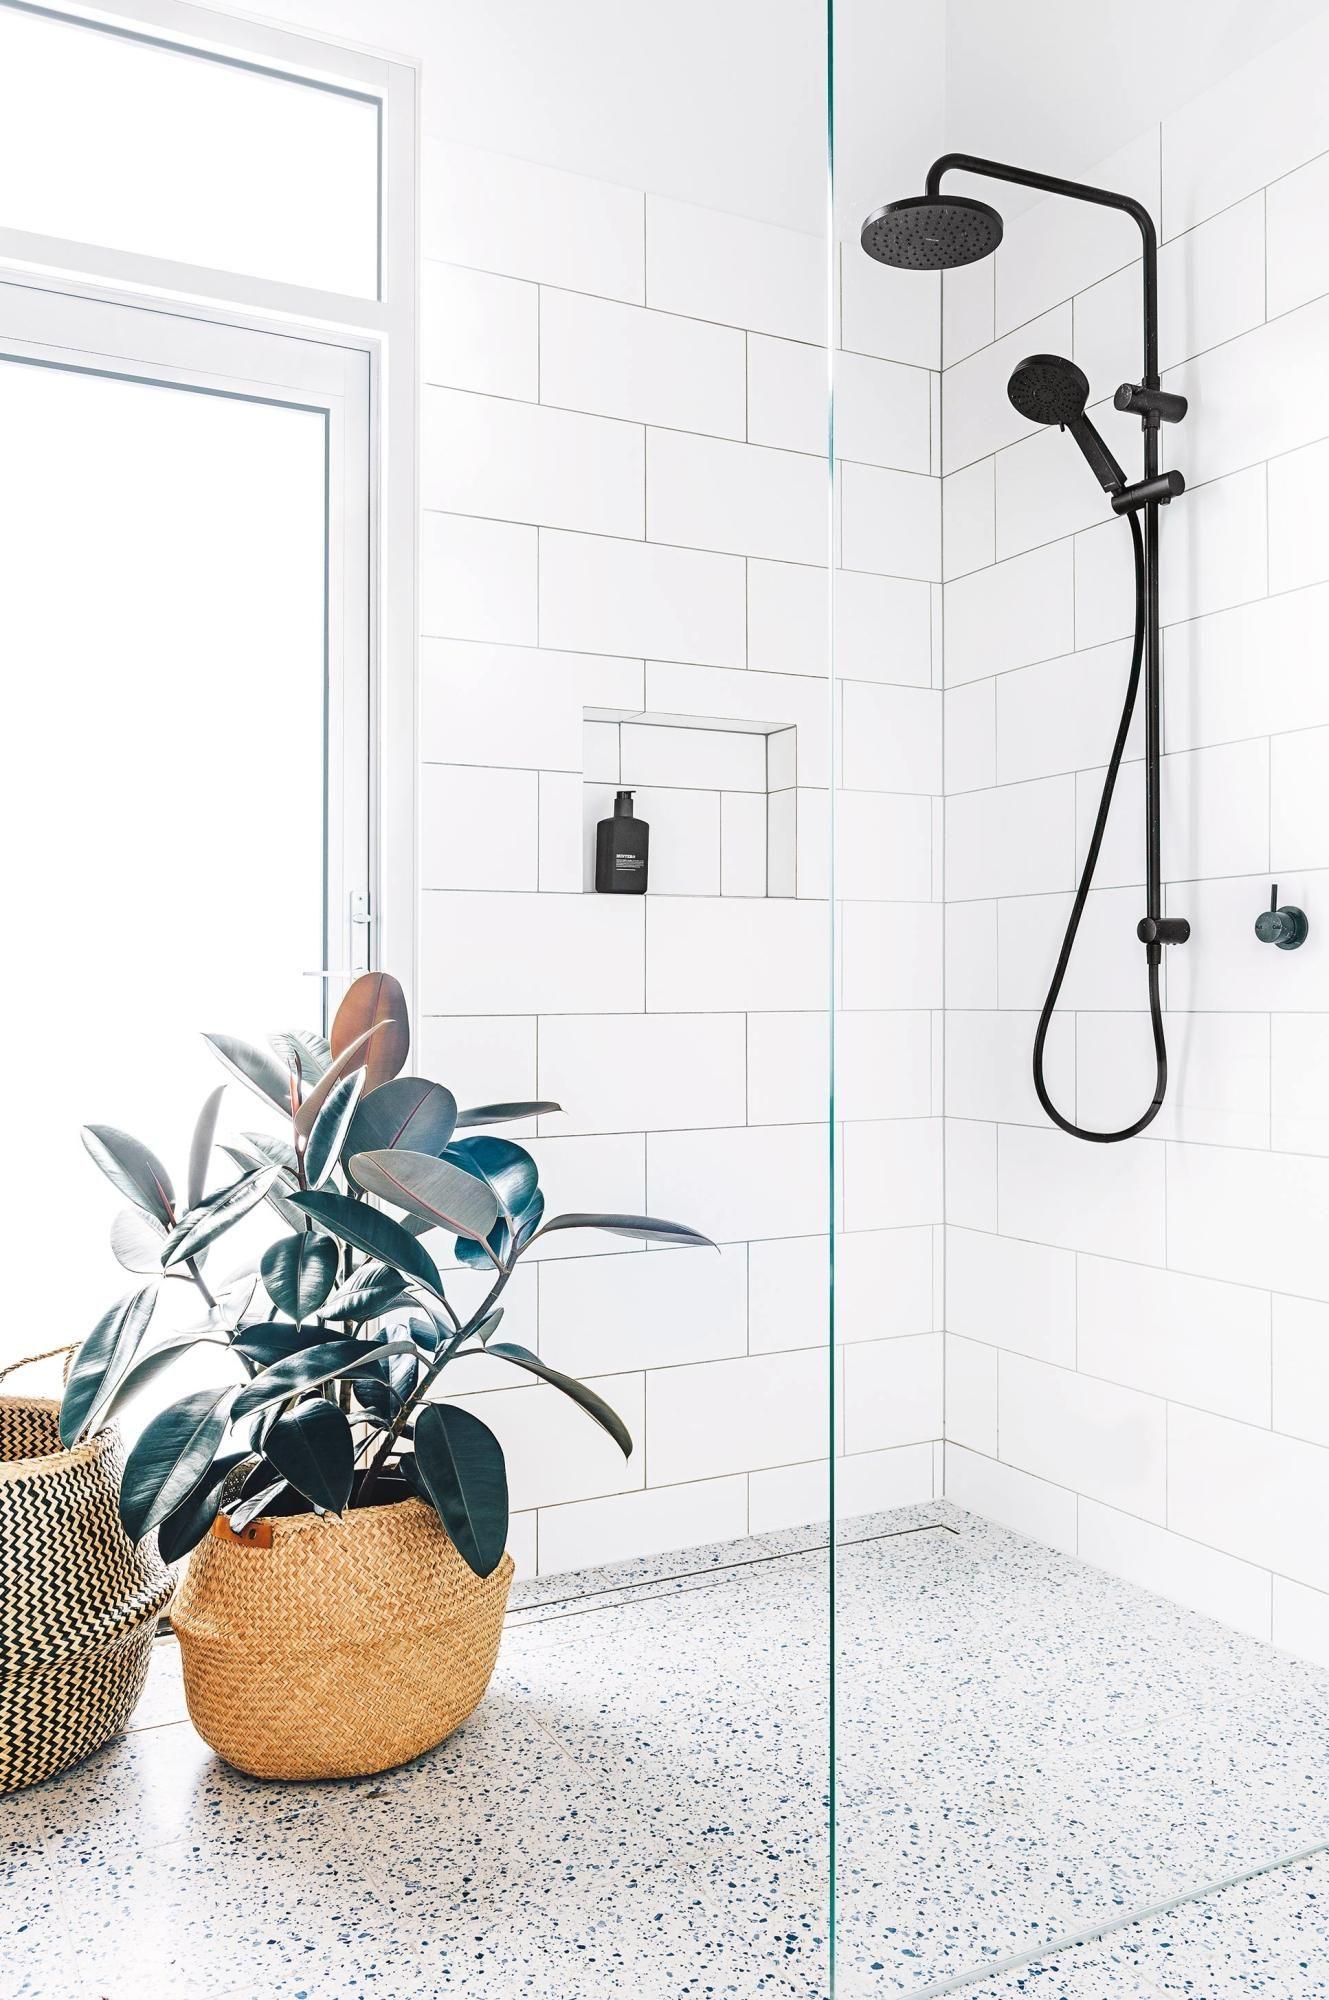 Alternative Carrelage Mural Salle De Bain step inside a bathroom built with smart and functional